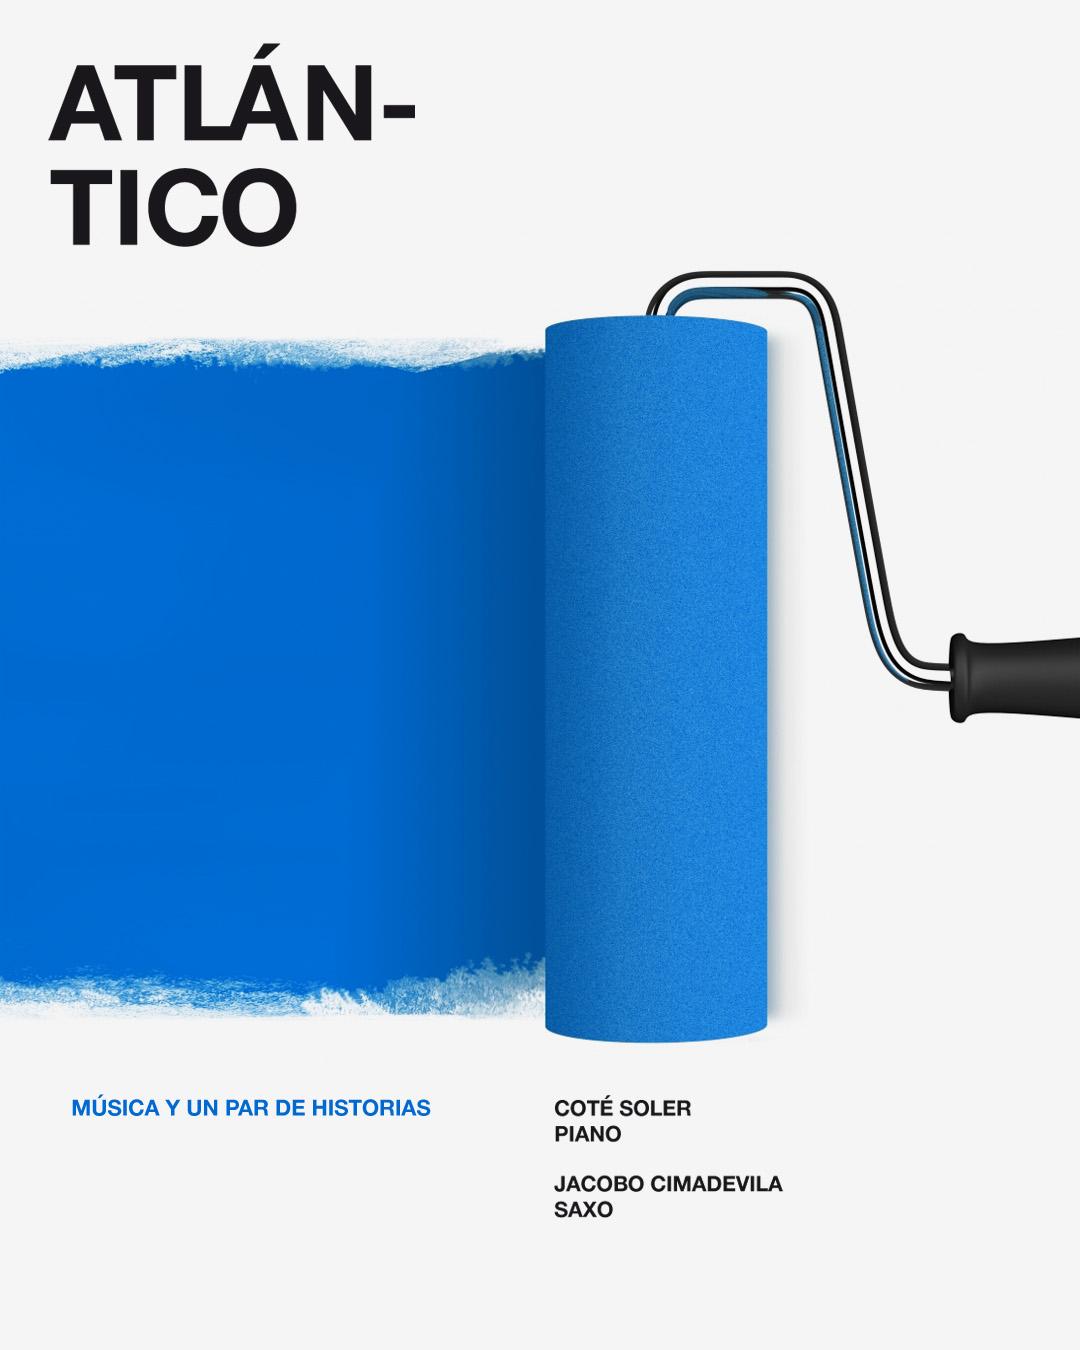 diseño de poster Atlántico